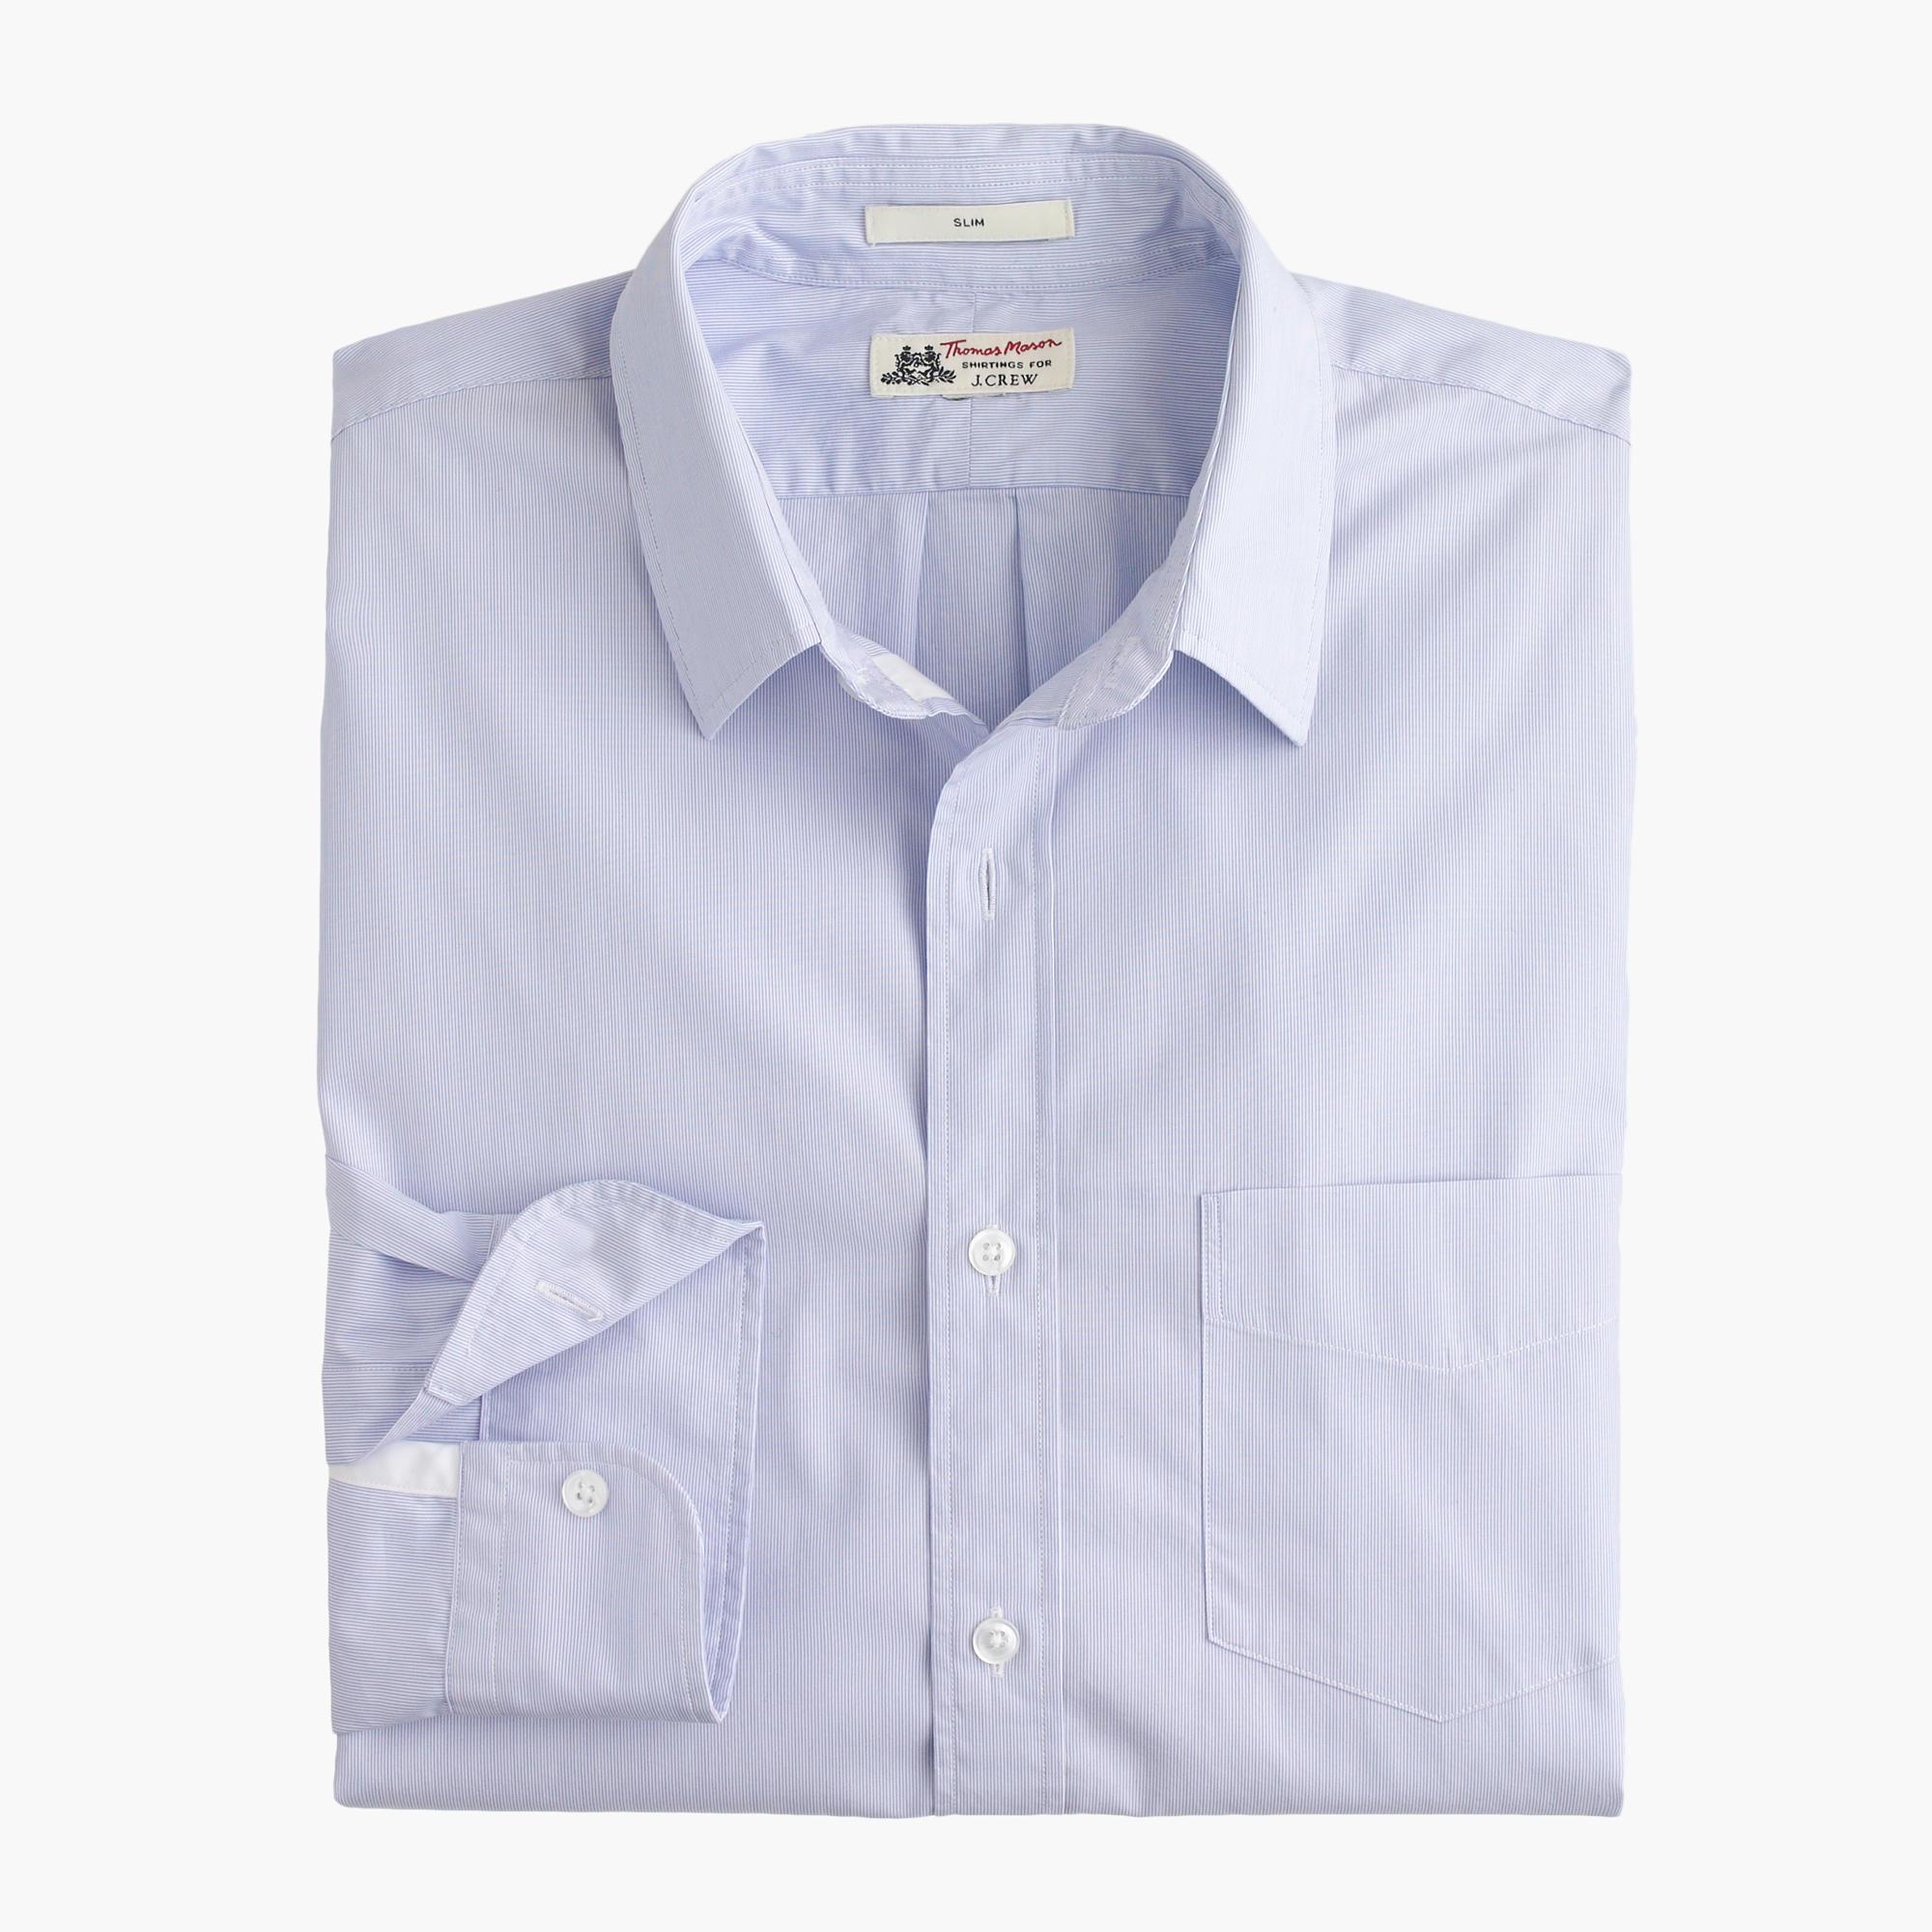 Slim thomas mason for j crew shirt in peri stripe men 39 s for Thomas mason dress shirts